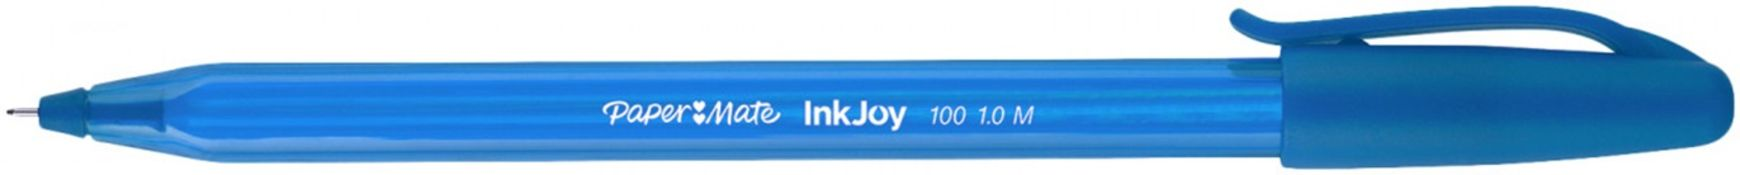 1,000 x Papermate Inkjoy Pens | Total RRP £500